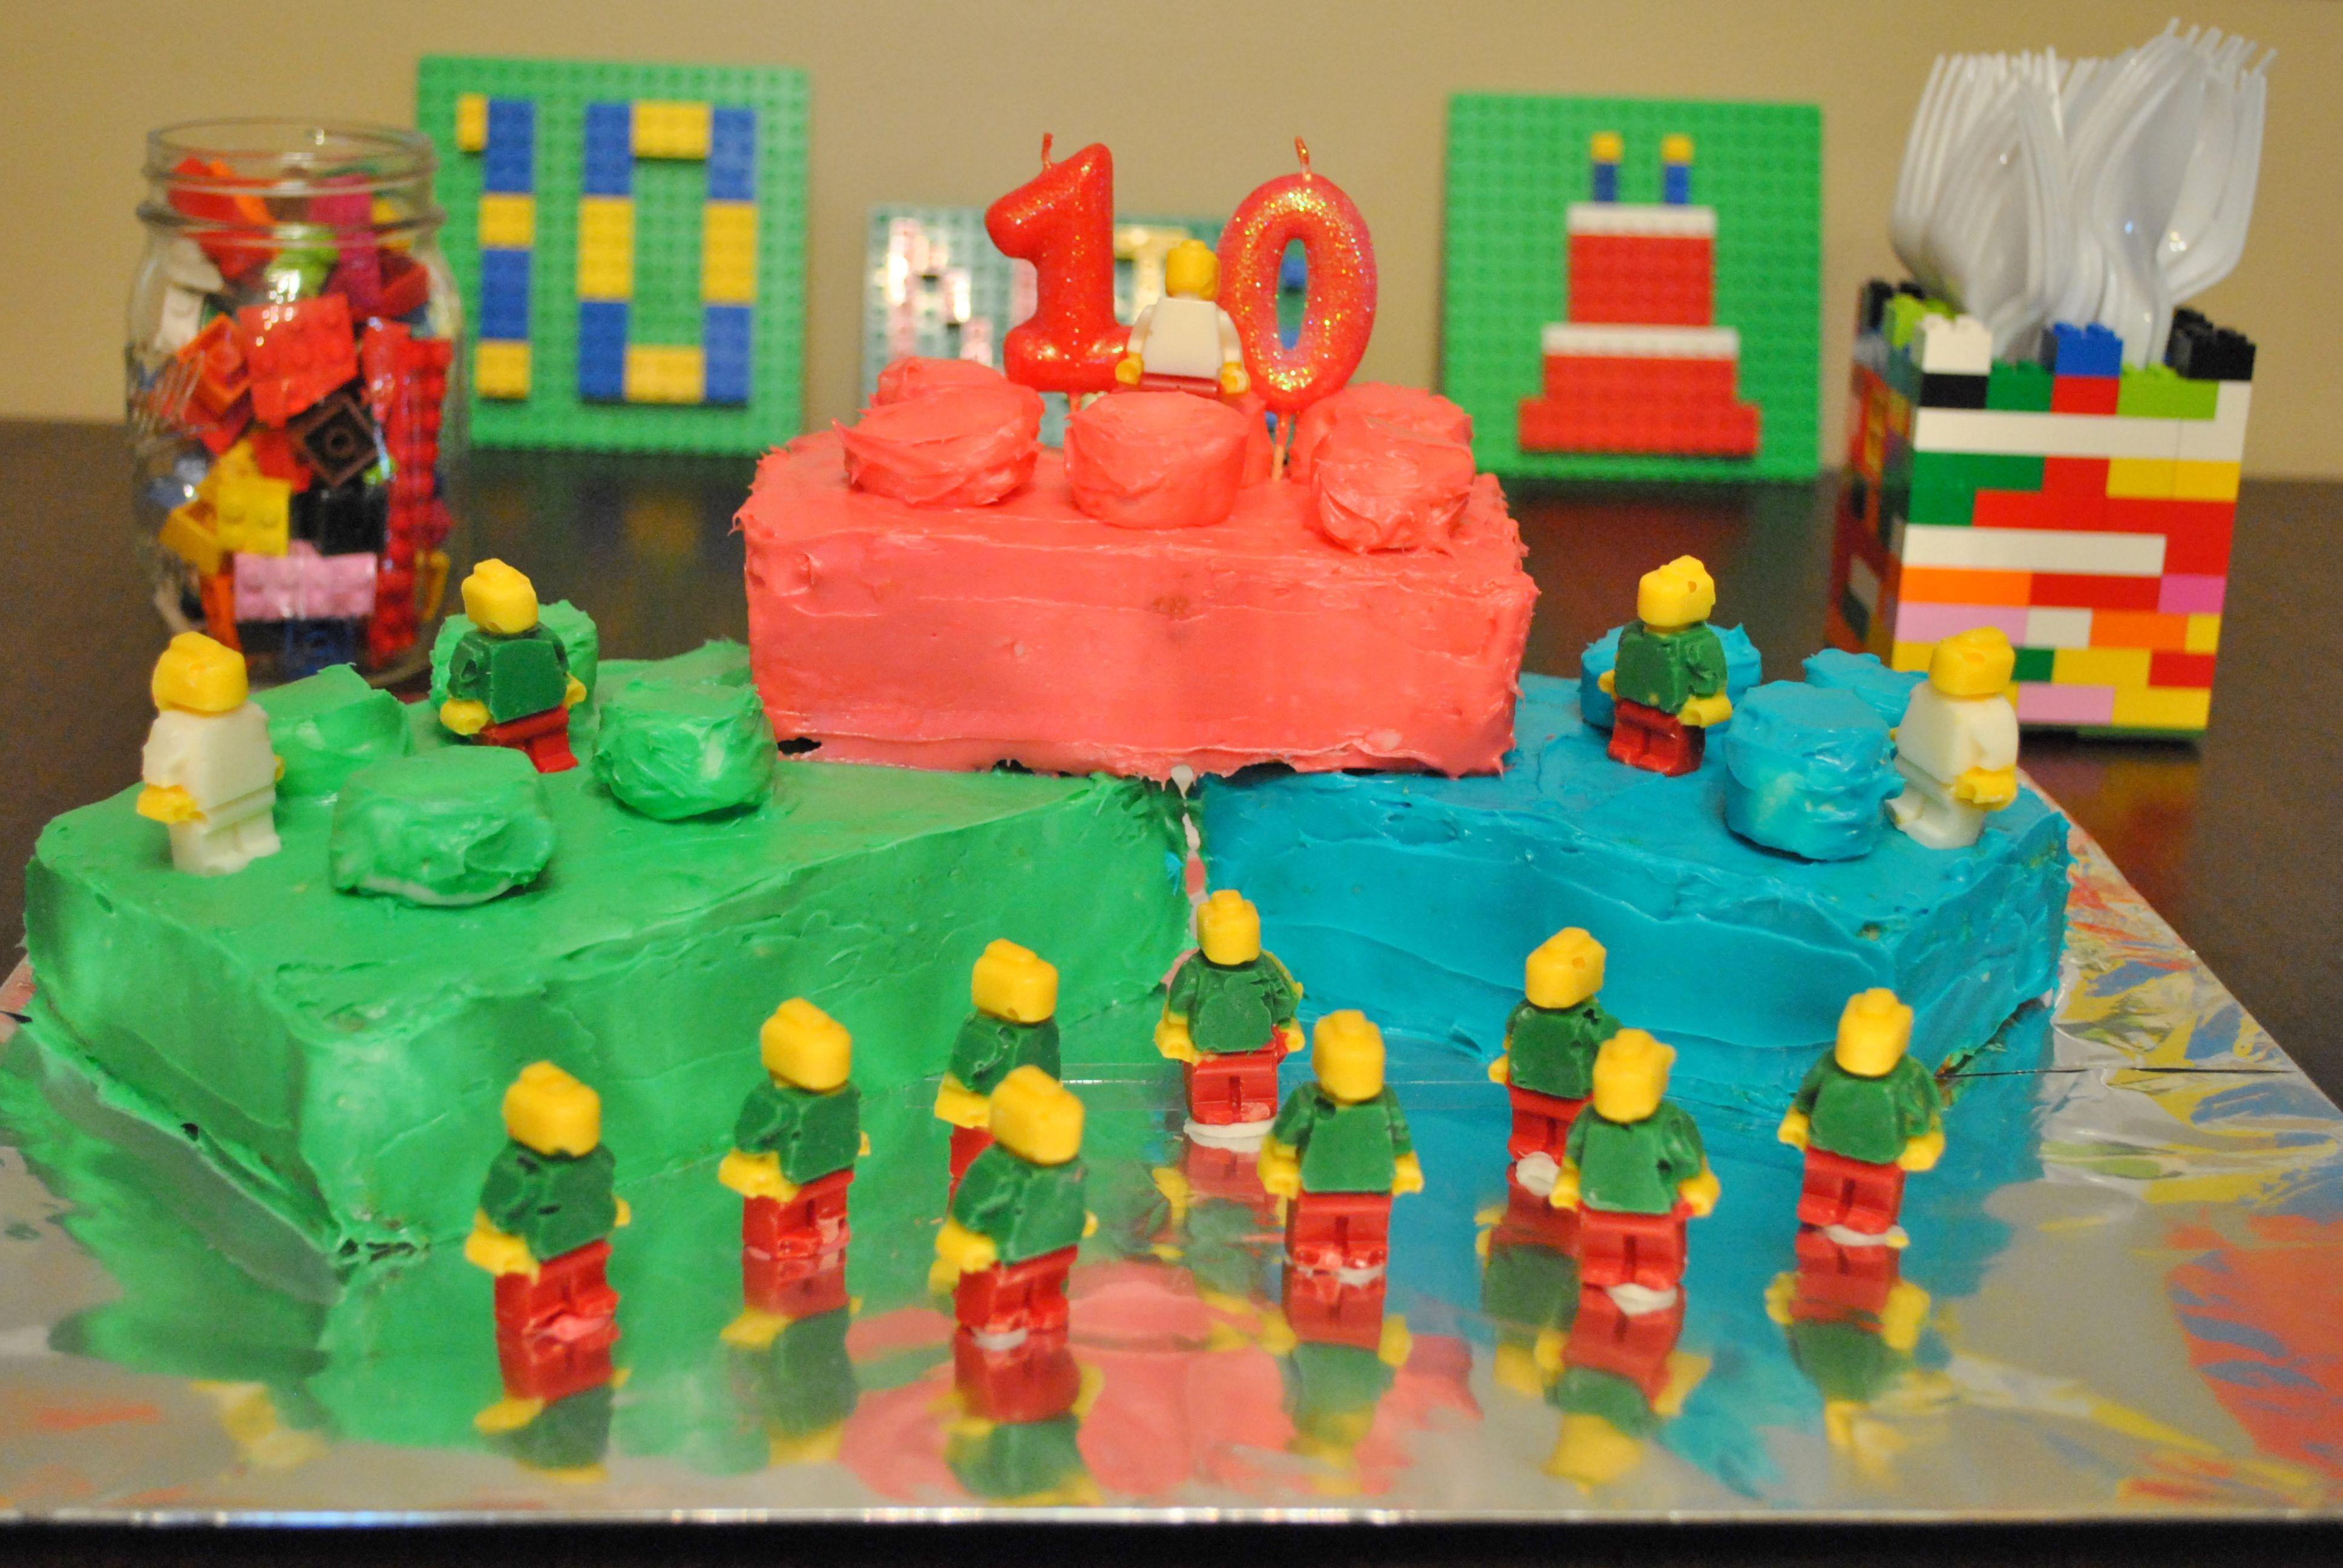 Birthday Cake Ideas Lego ~ Kids lego cake ideas lego cake kids birthday cake